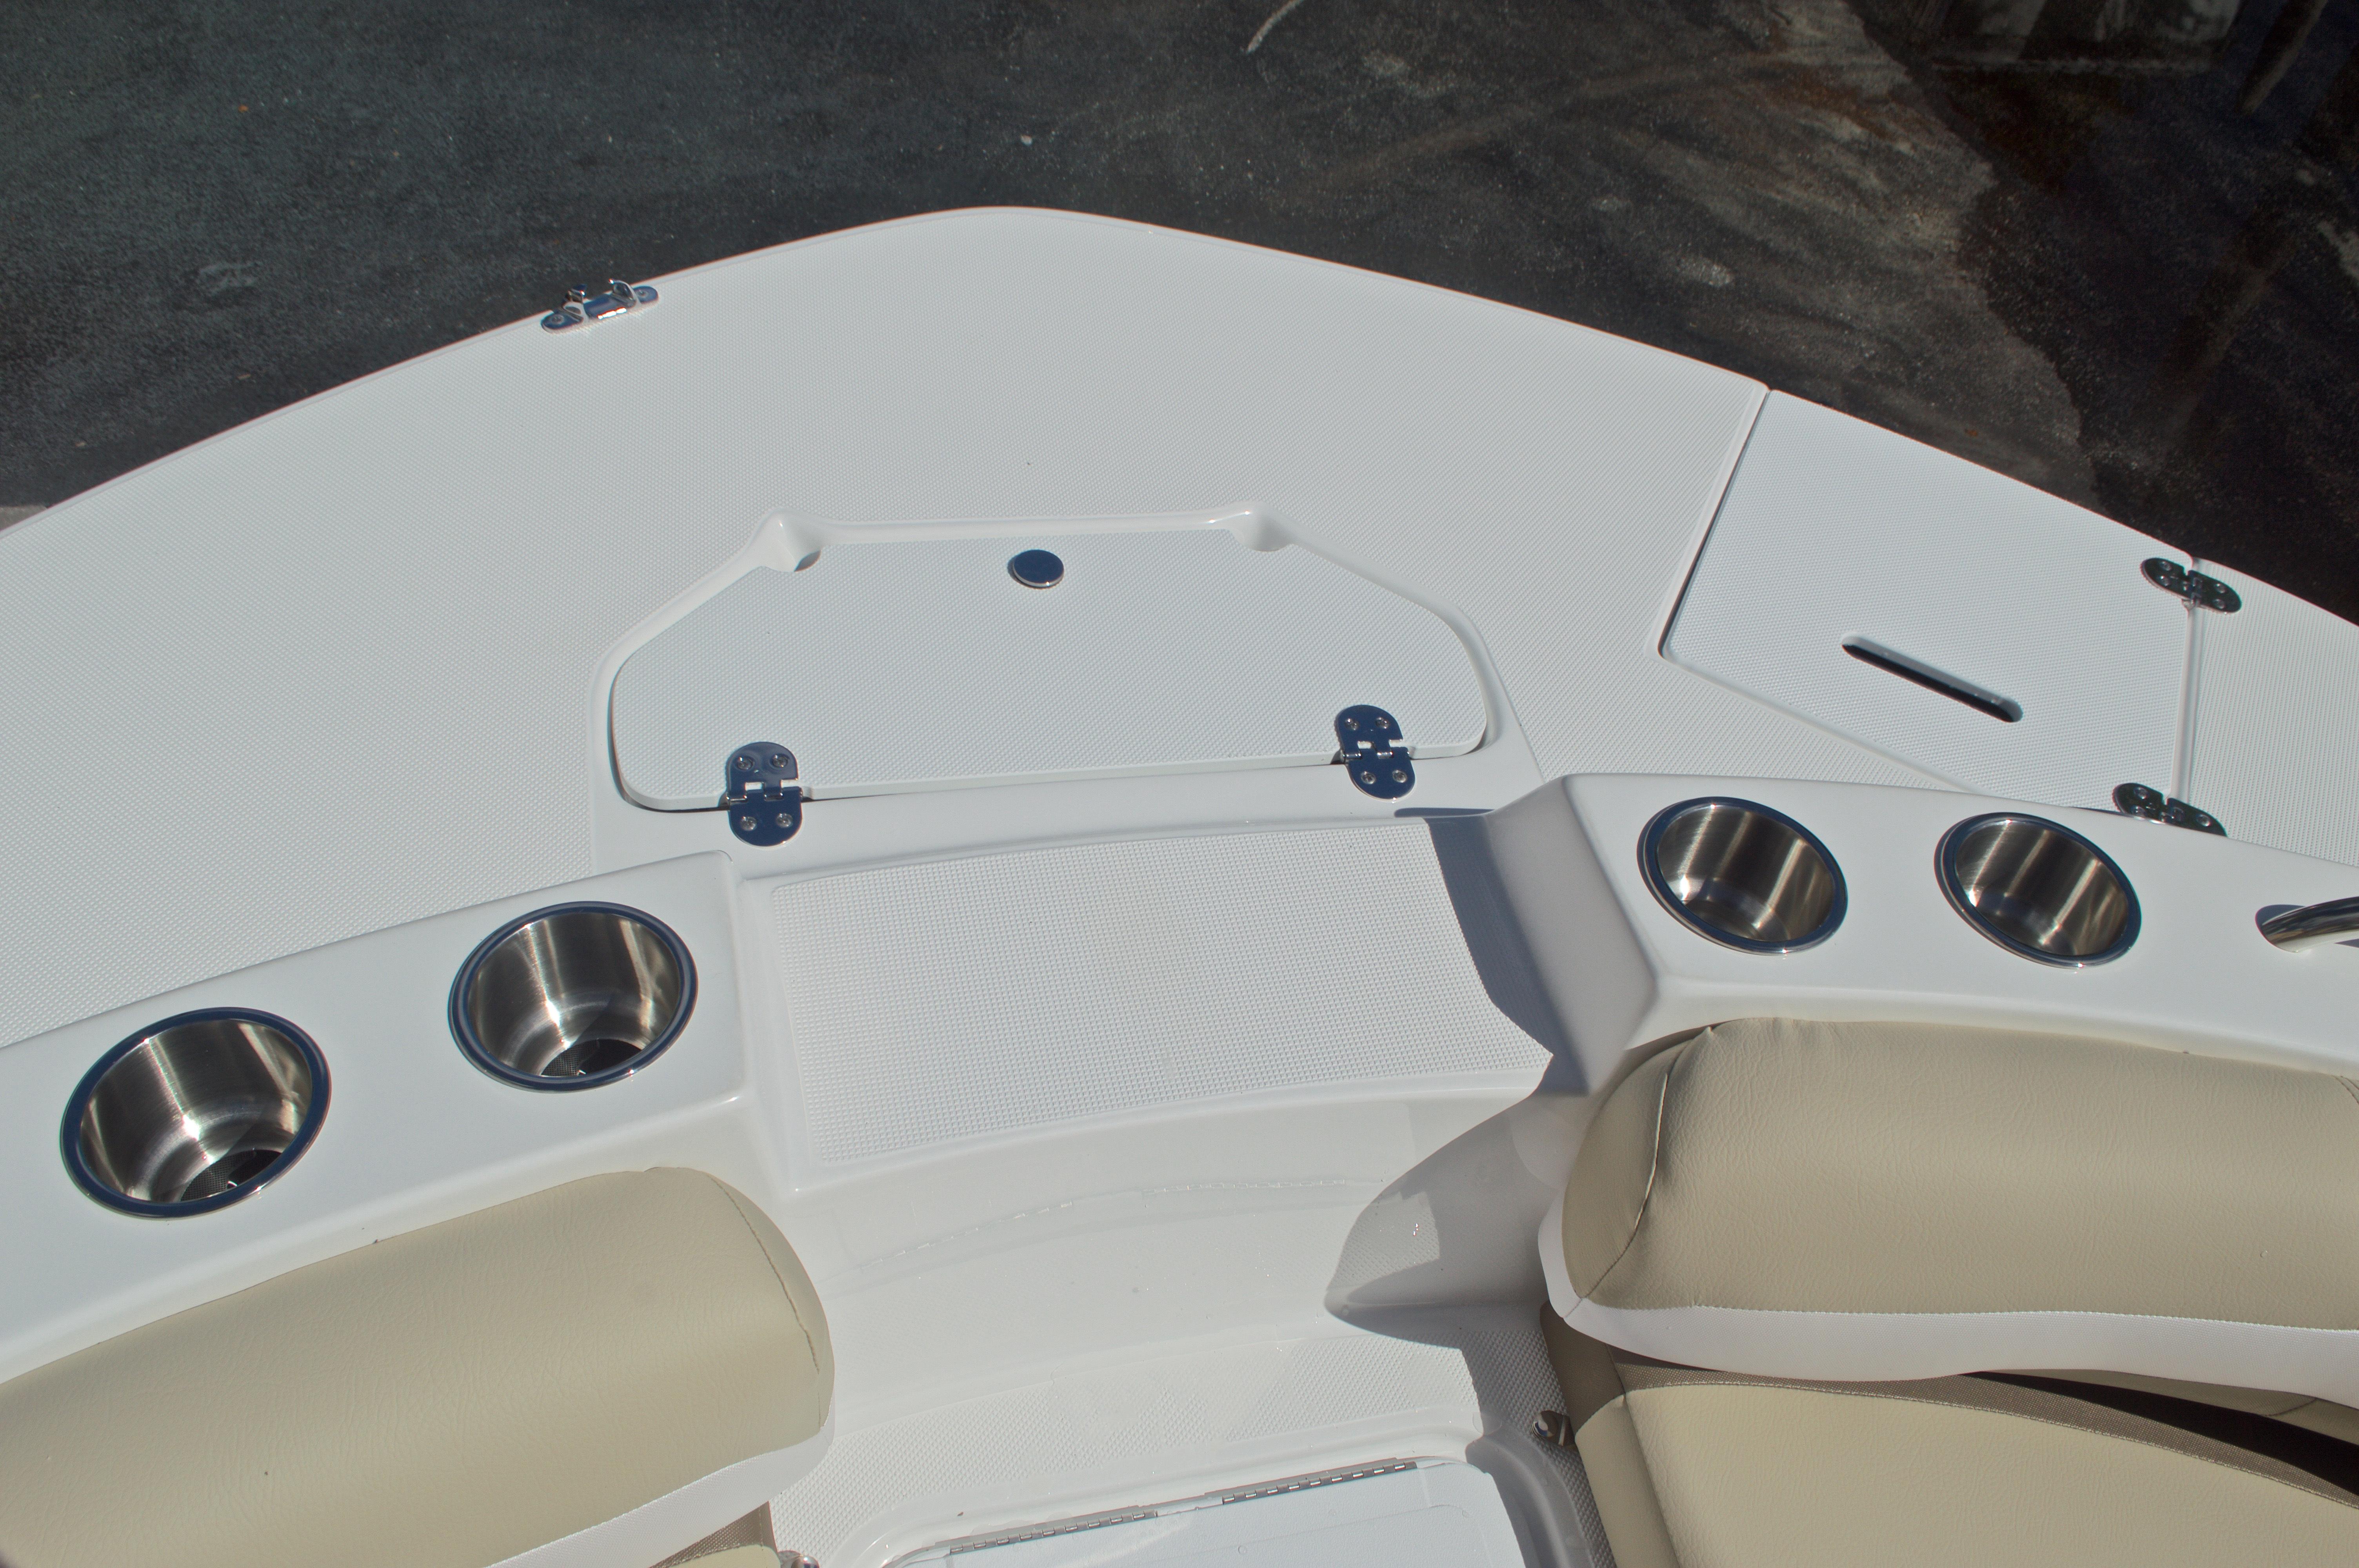 Thumbnail 48 for New 2017 Hurricane CC21 Center Console boat for sale in Vero Beach, FL